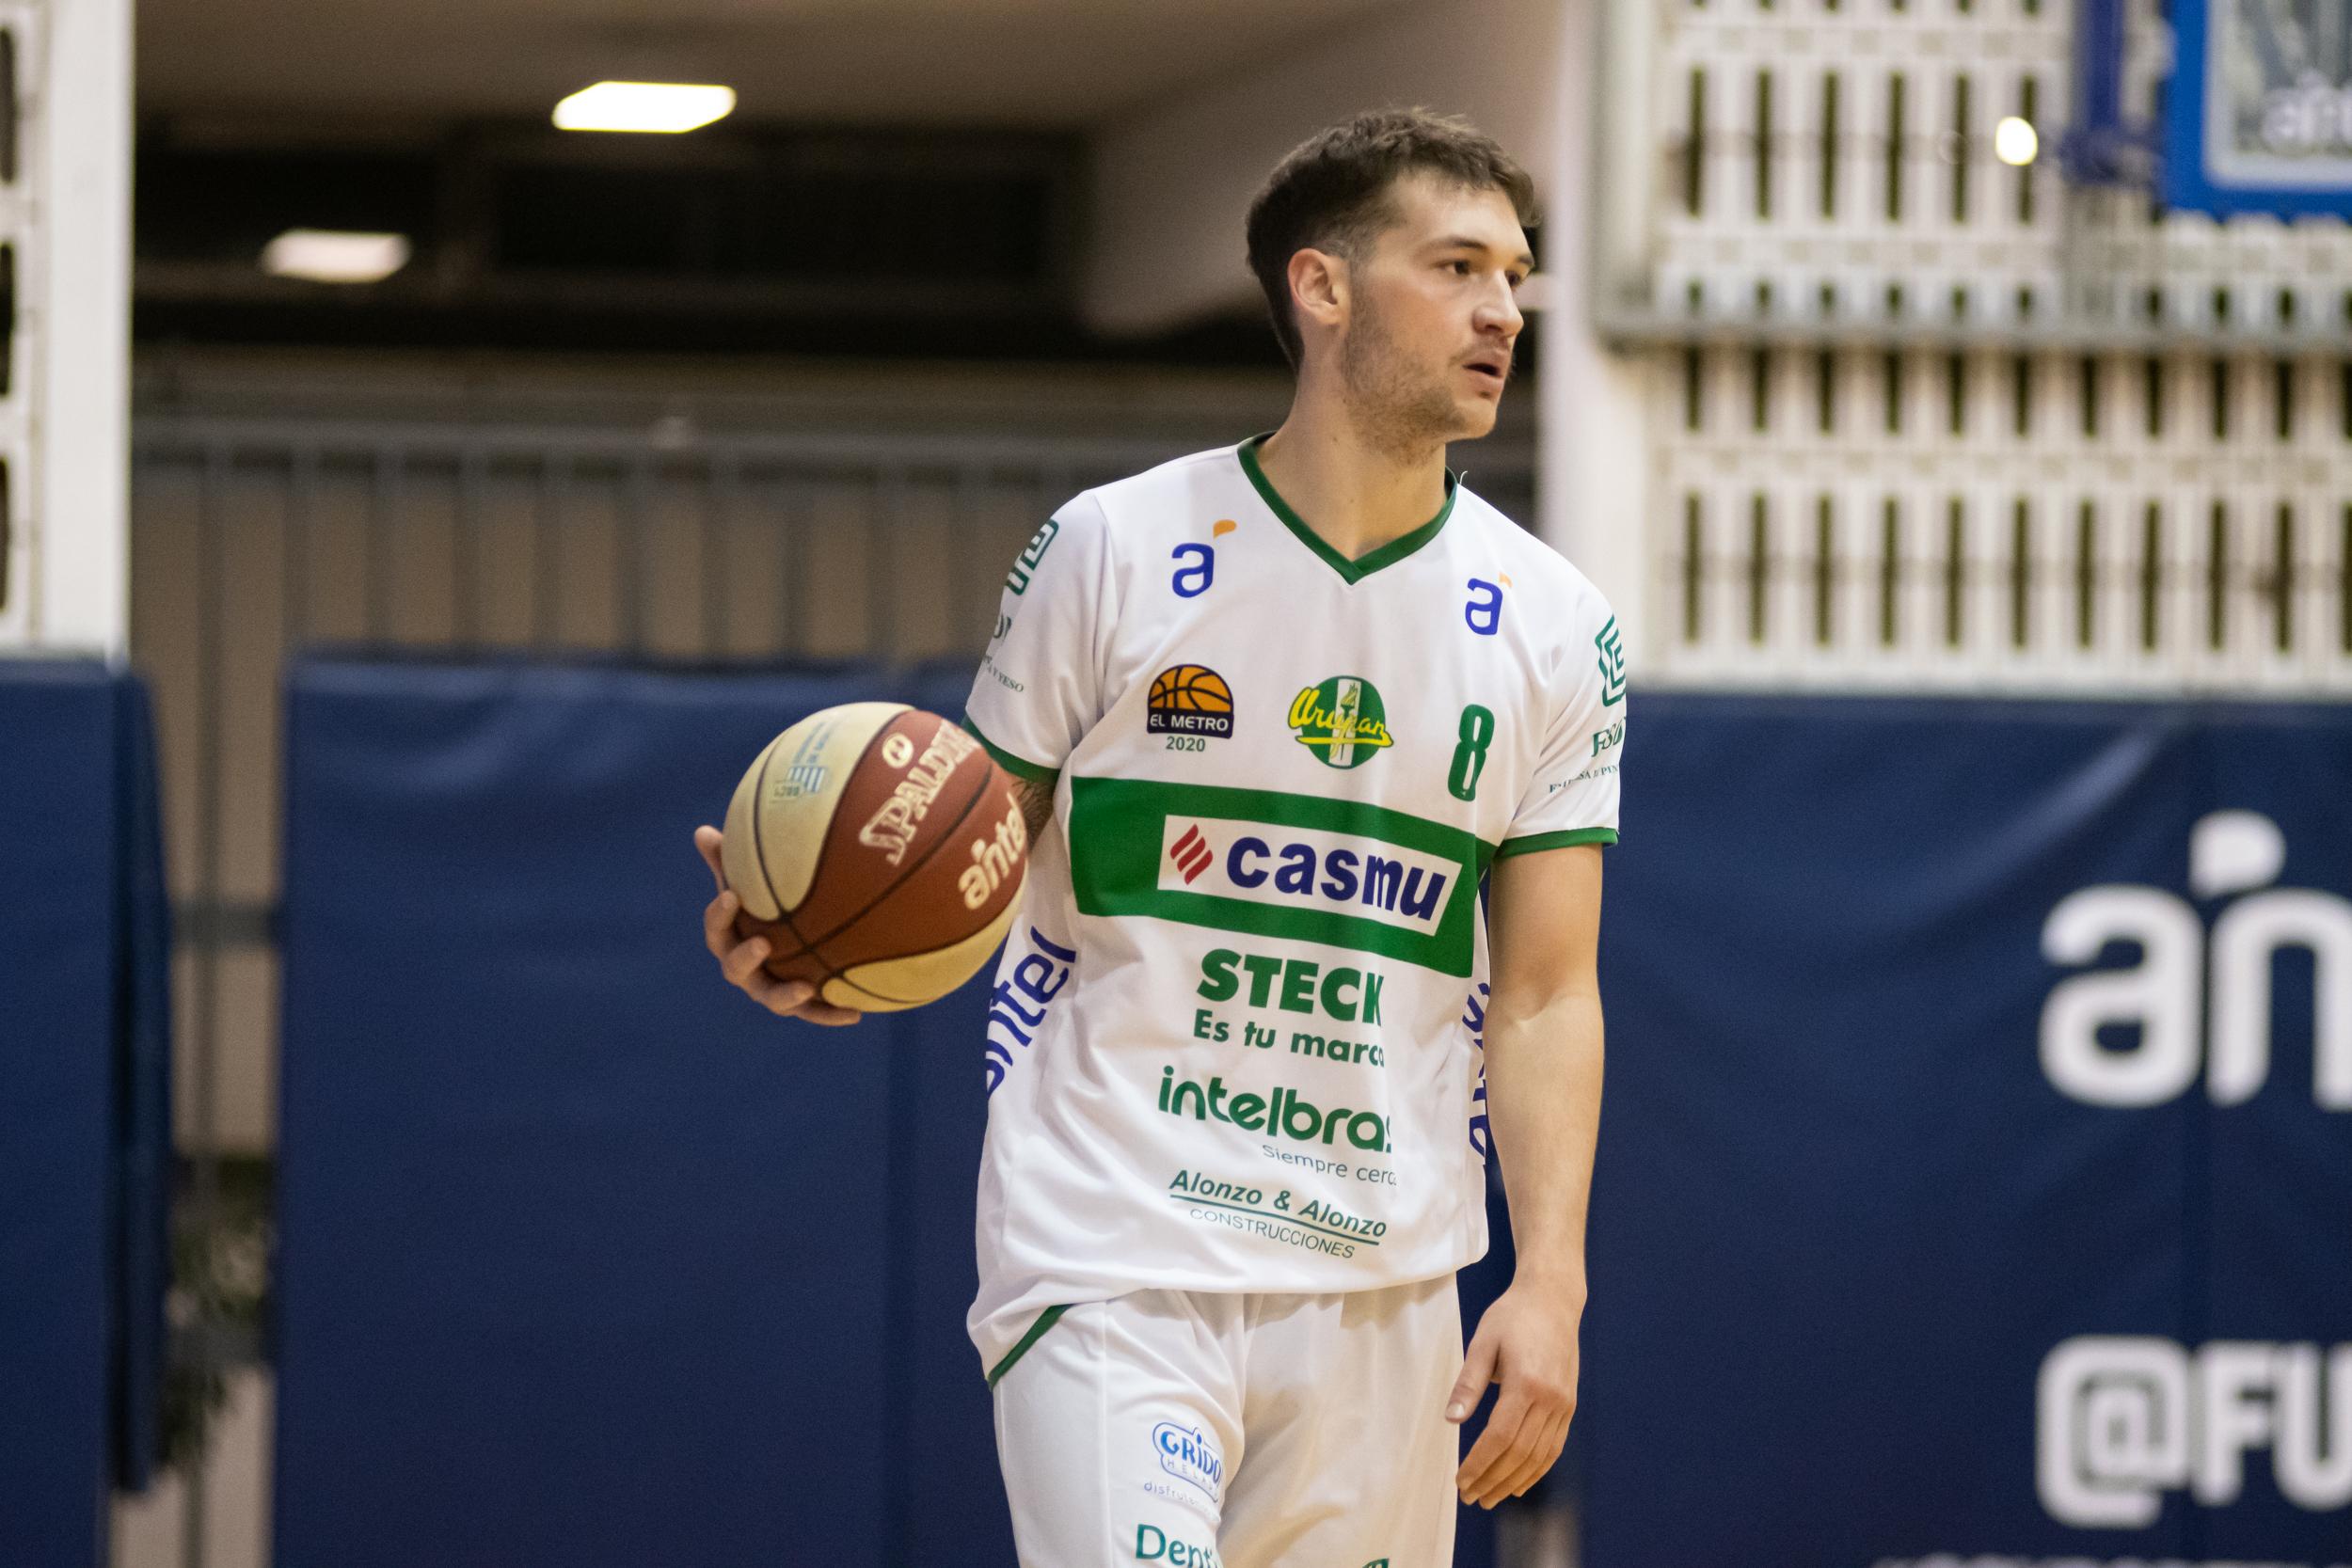 Nicola Pomoli